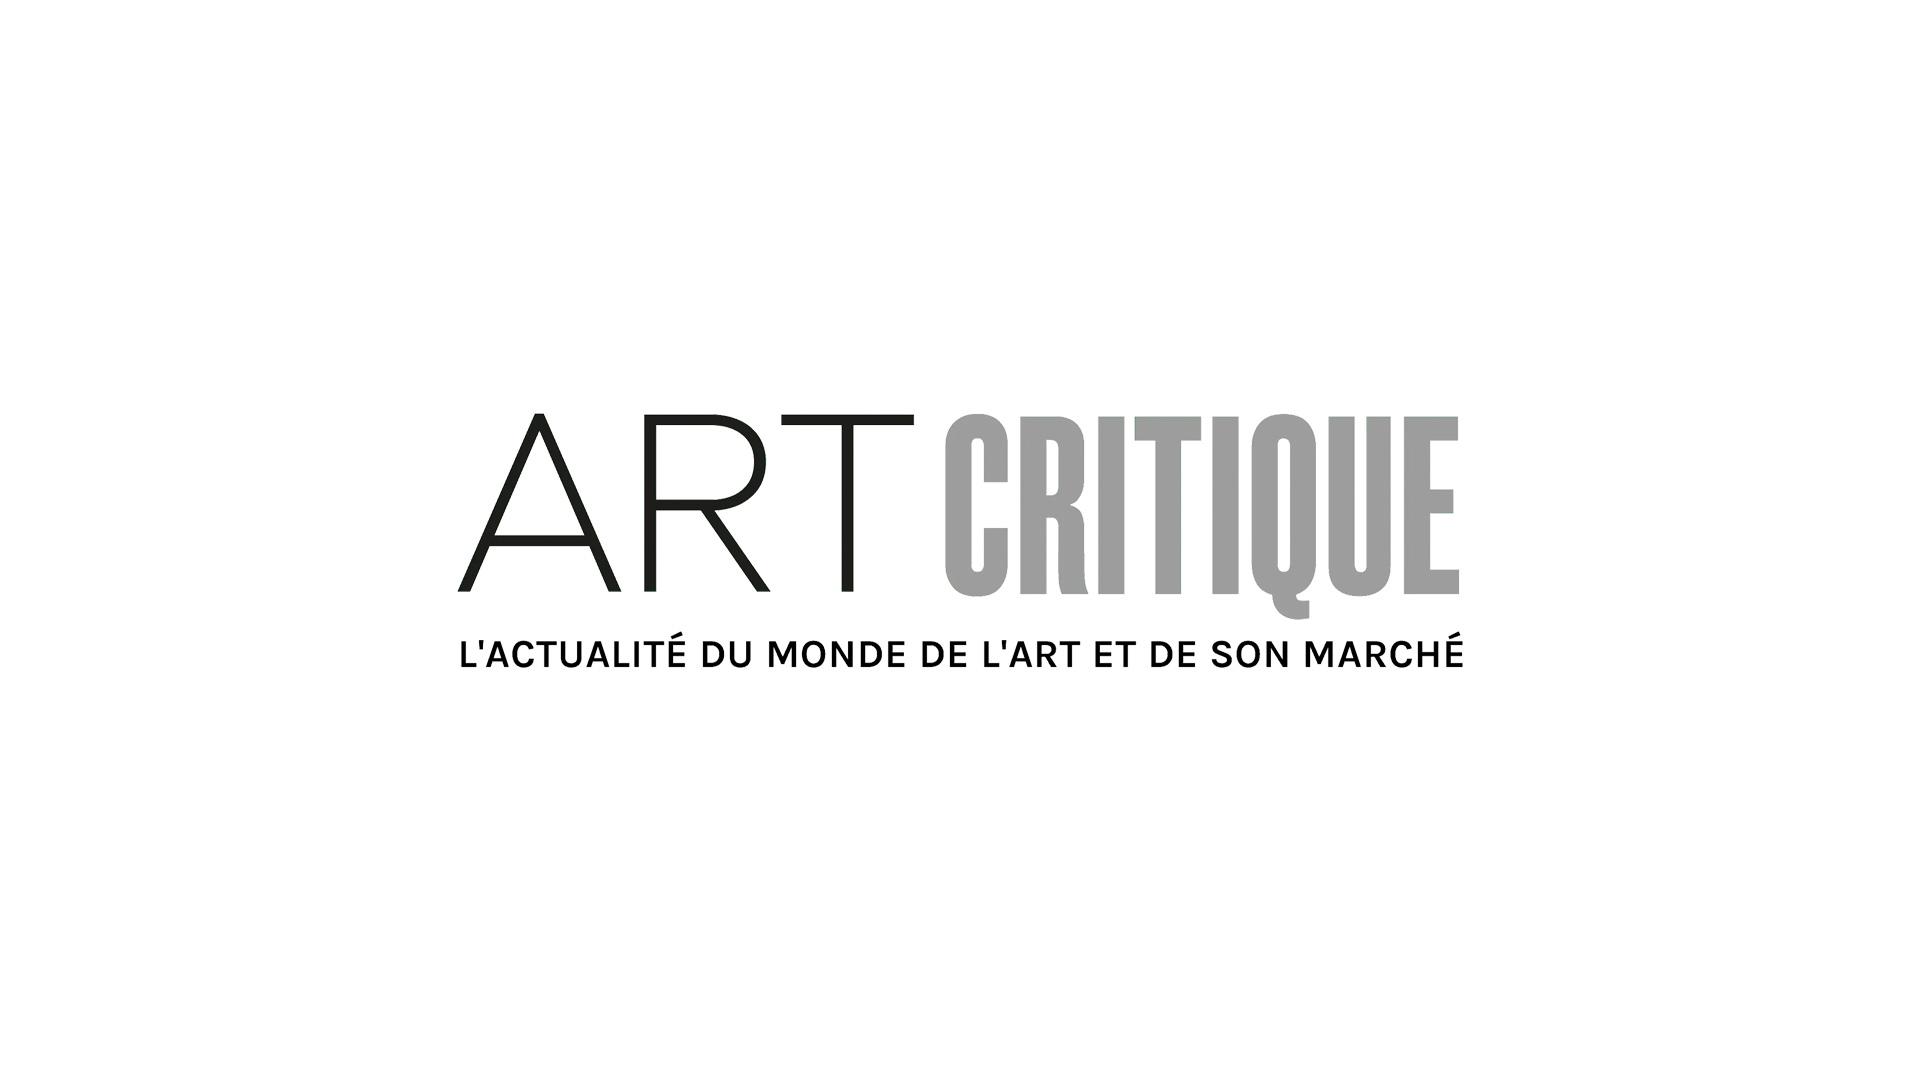 Andres Serrano puts Donald Trump on display in huge way